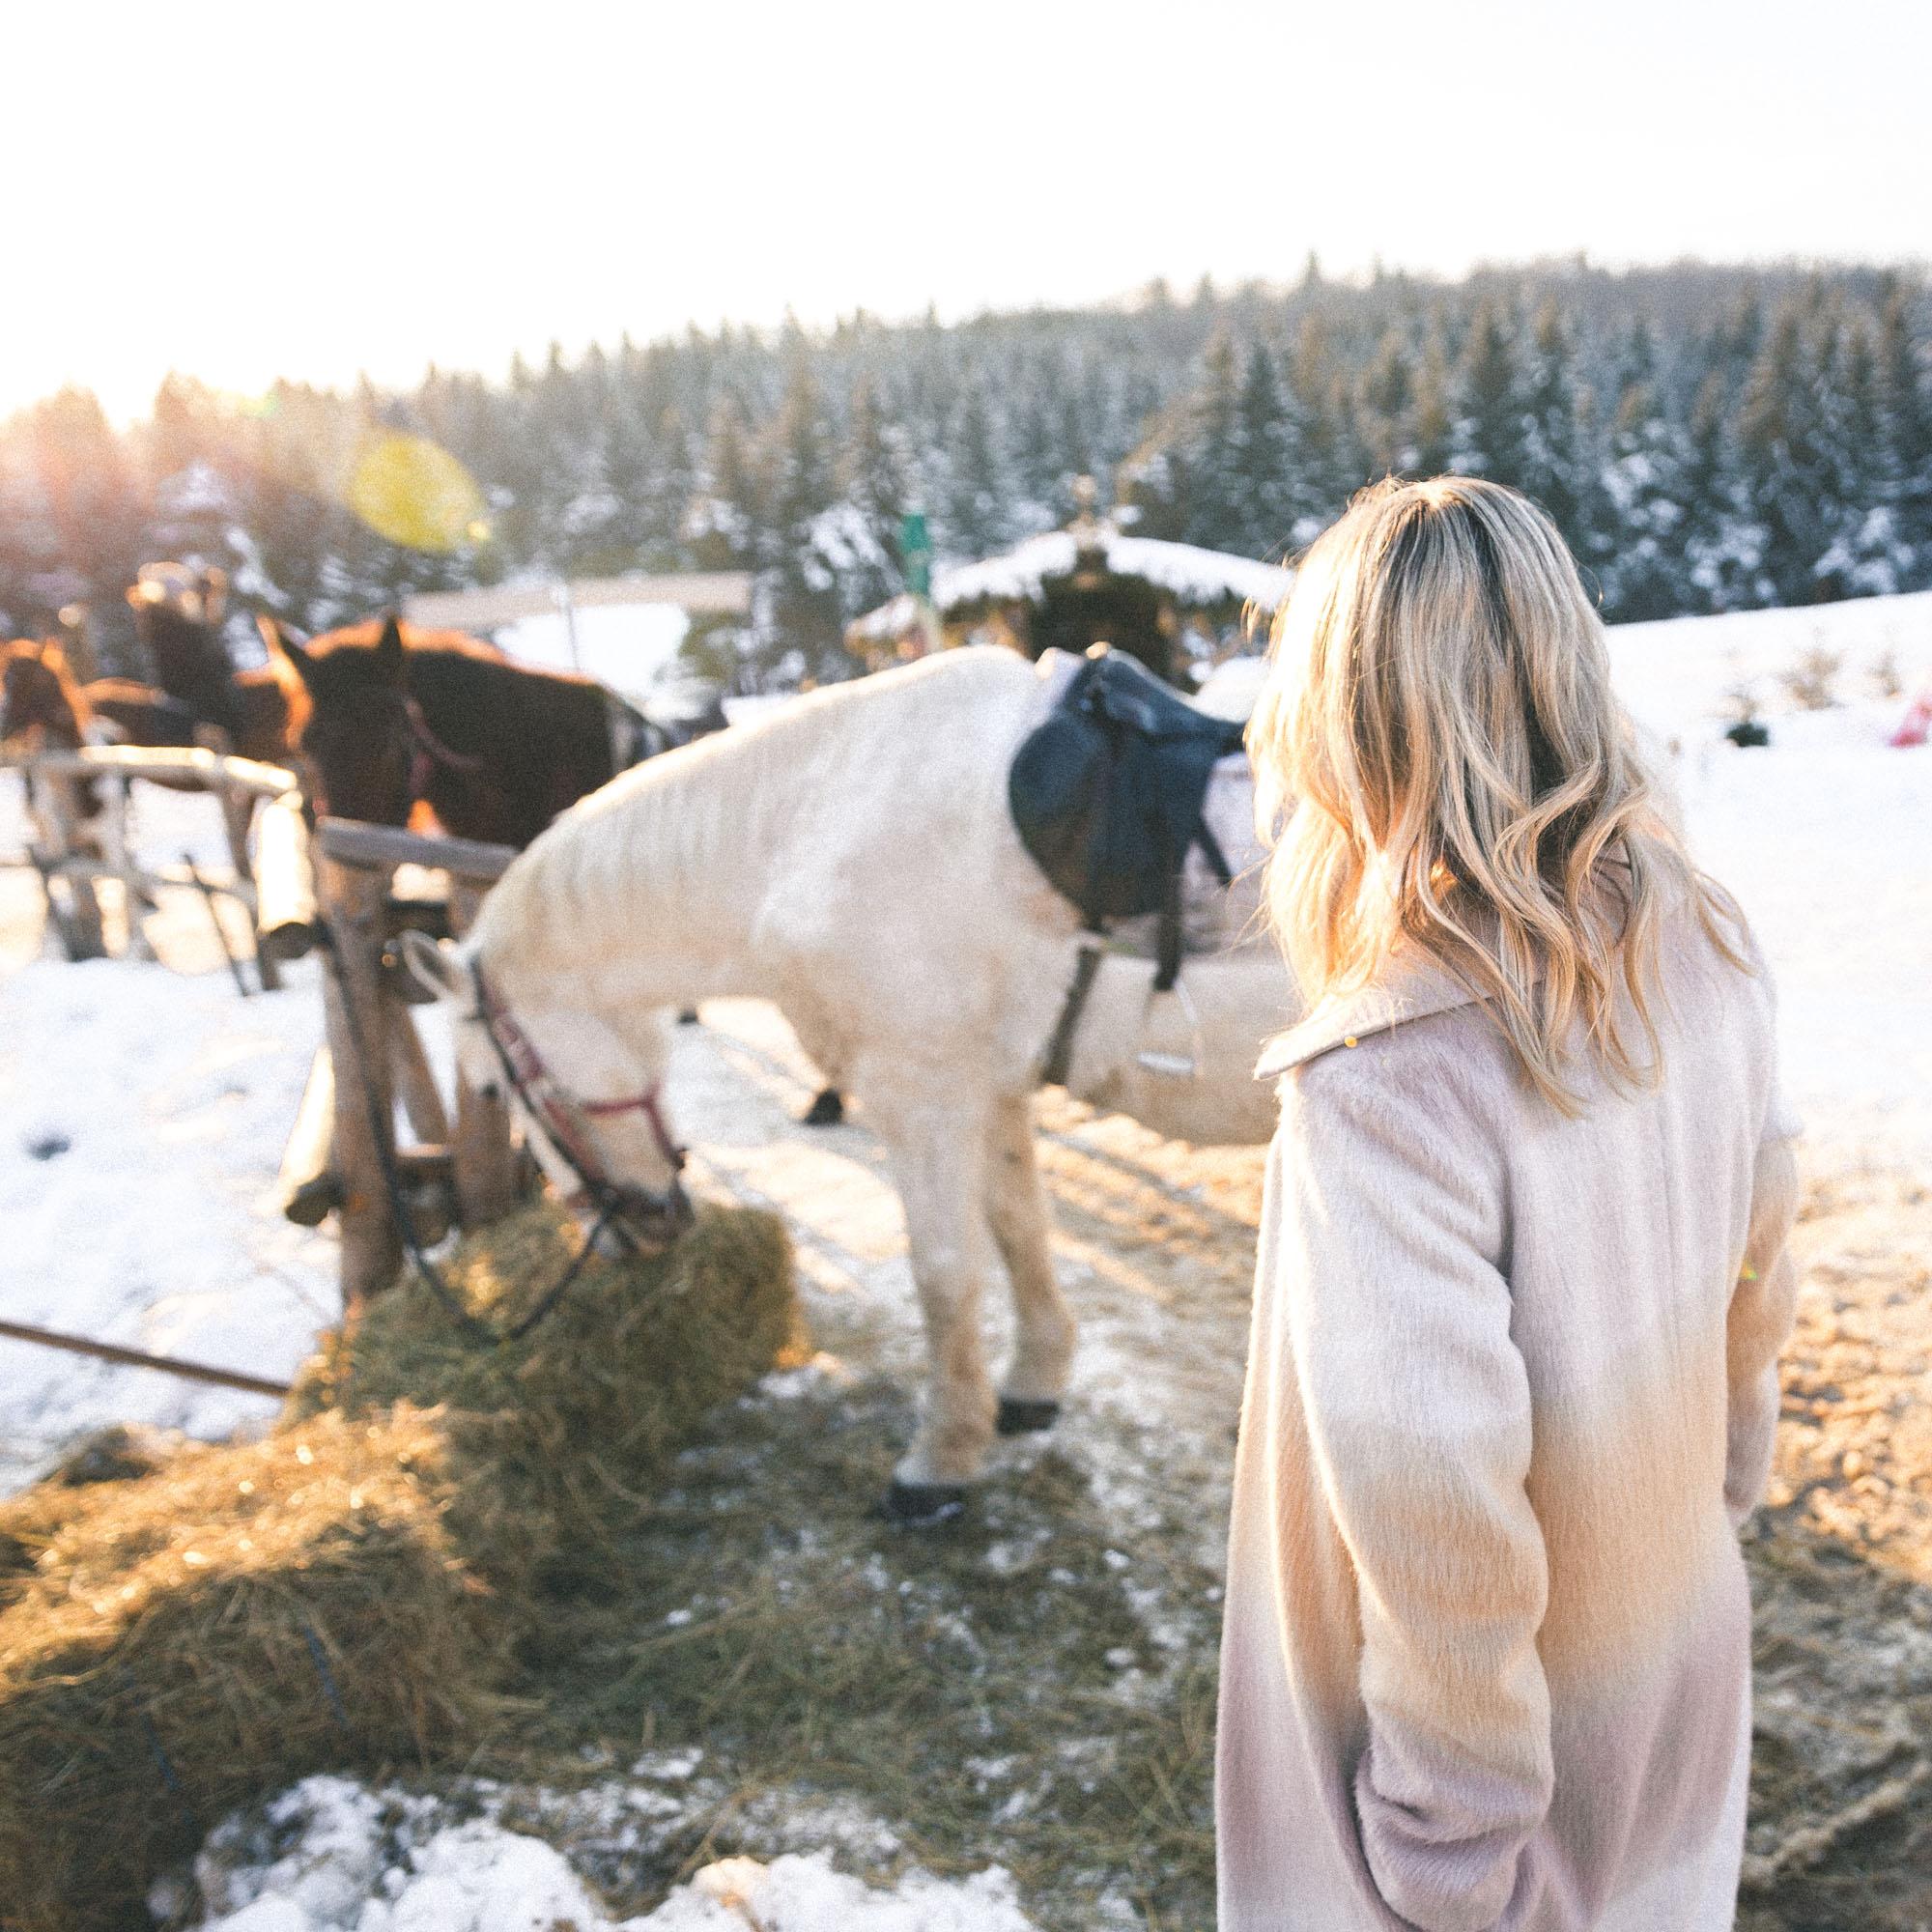 Horses in Romania via Find Us Lost